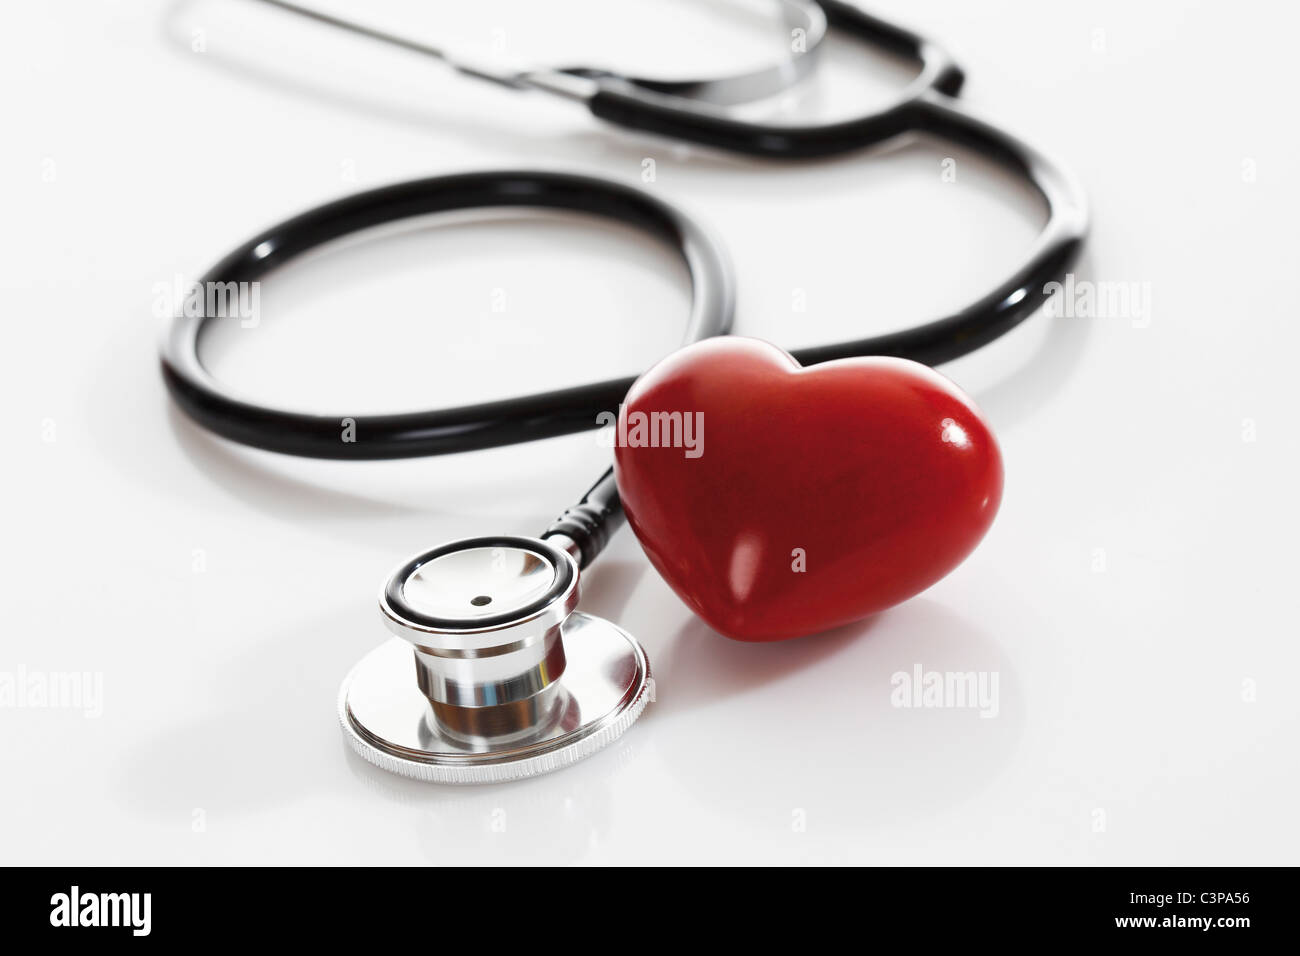 Stethoscope with heart shape object on white background, close up - Stock Image